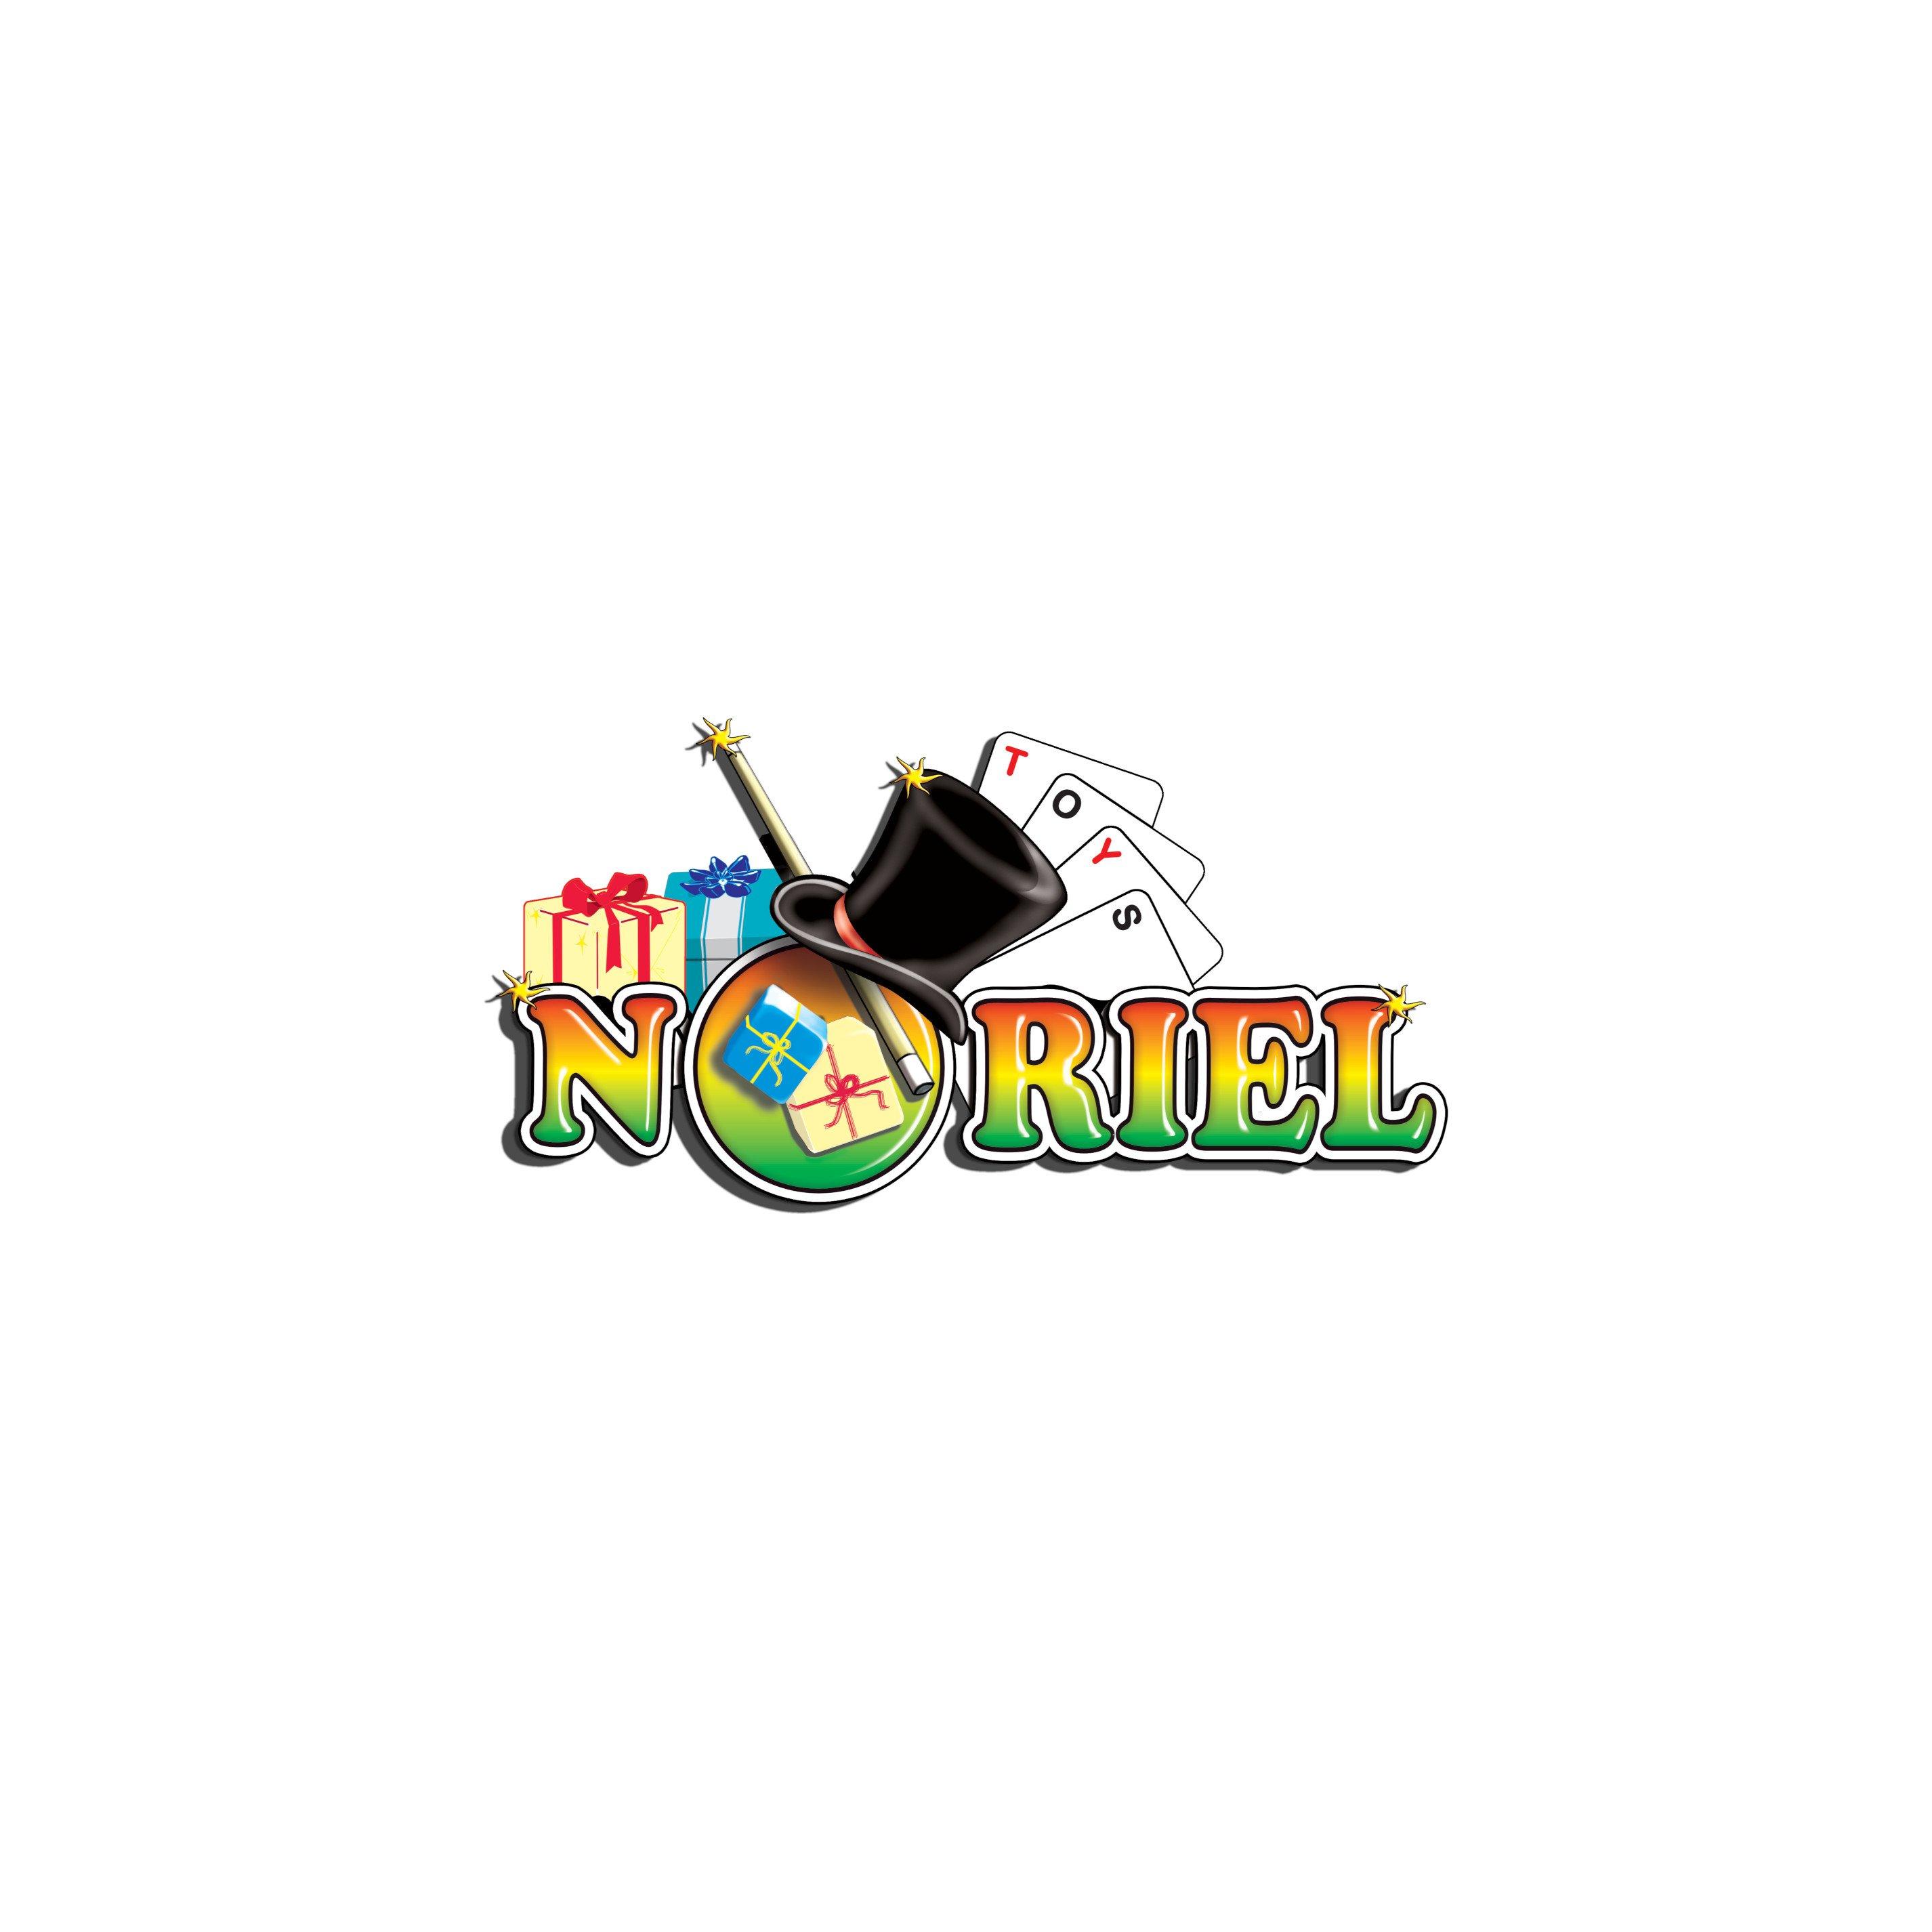 Jacheta copii 5.10.15. Mix & Match 2G2907